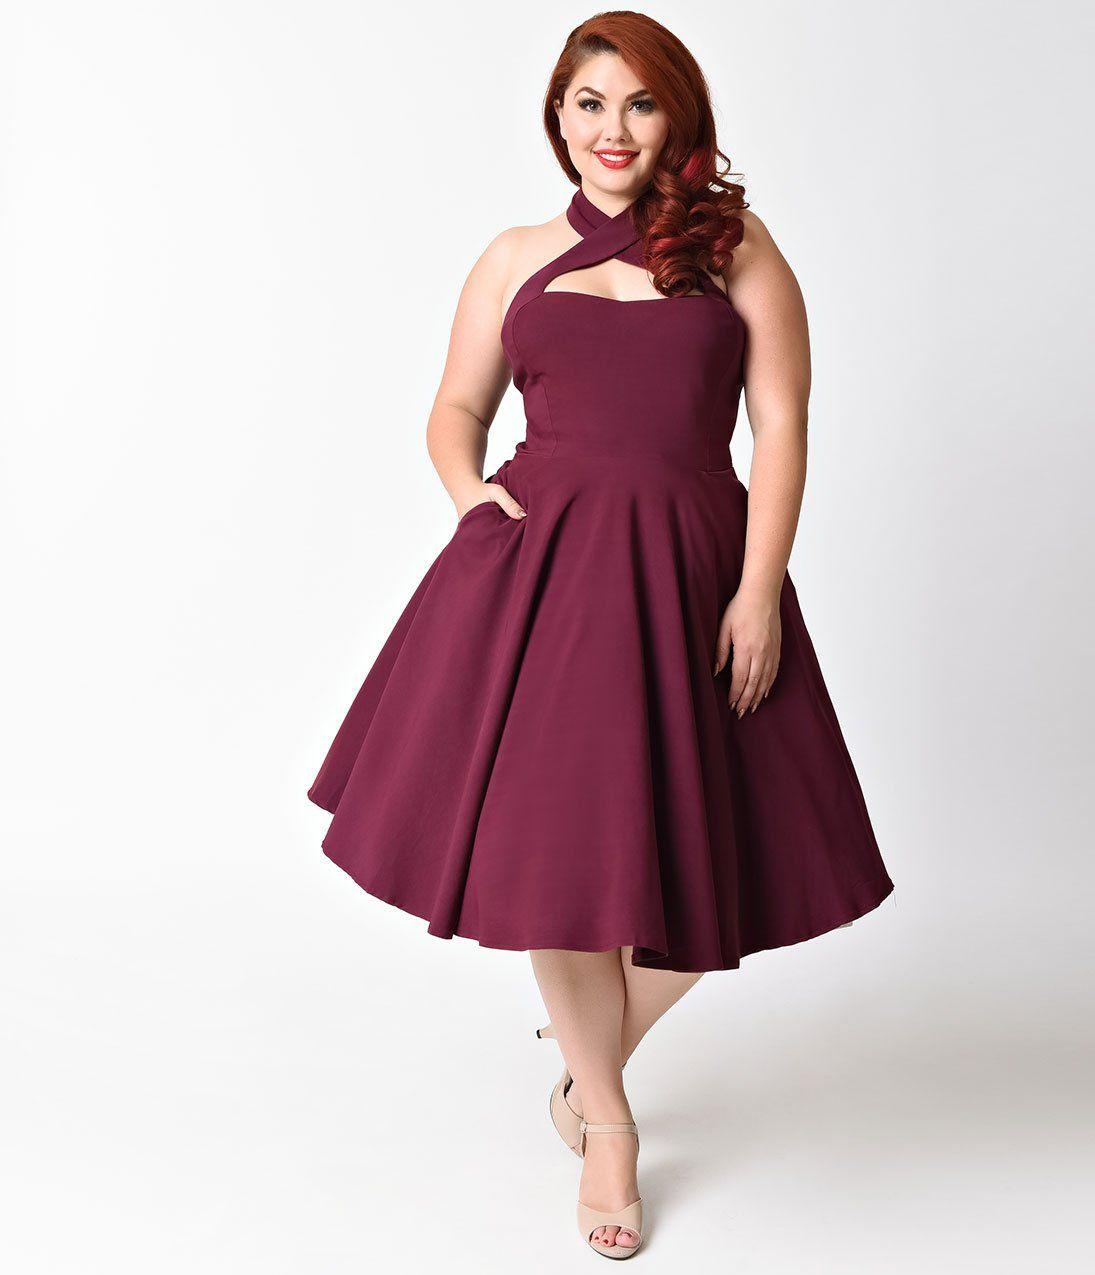 e7dde4948f3 Unique Vintage Plus Size 1950s Style Purple Criss Cross Halter Flare Rita  Dress